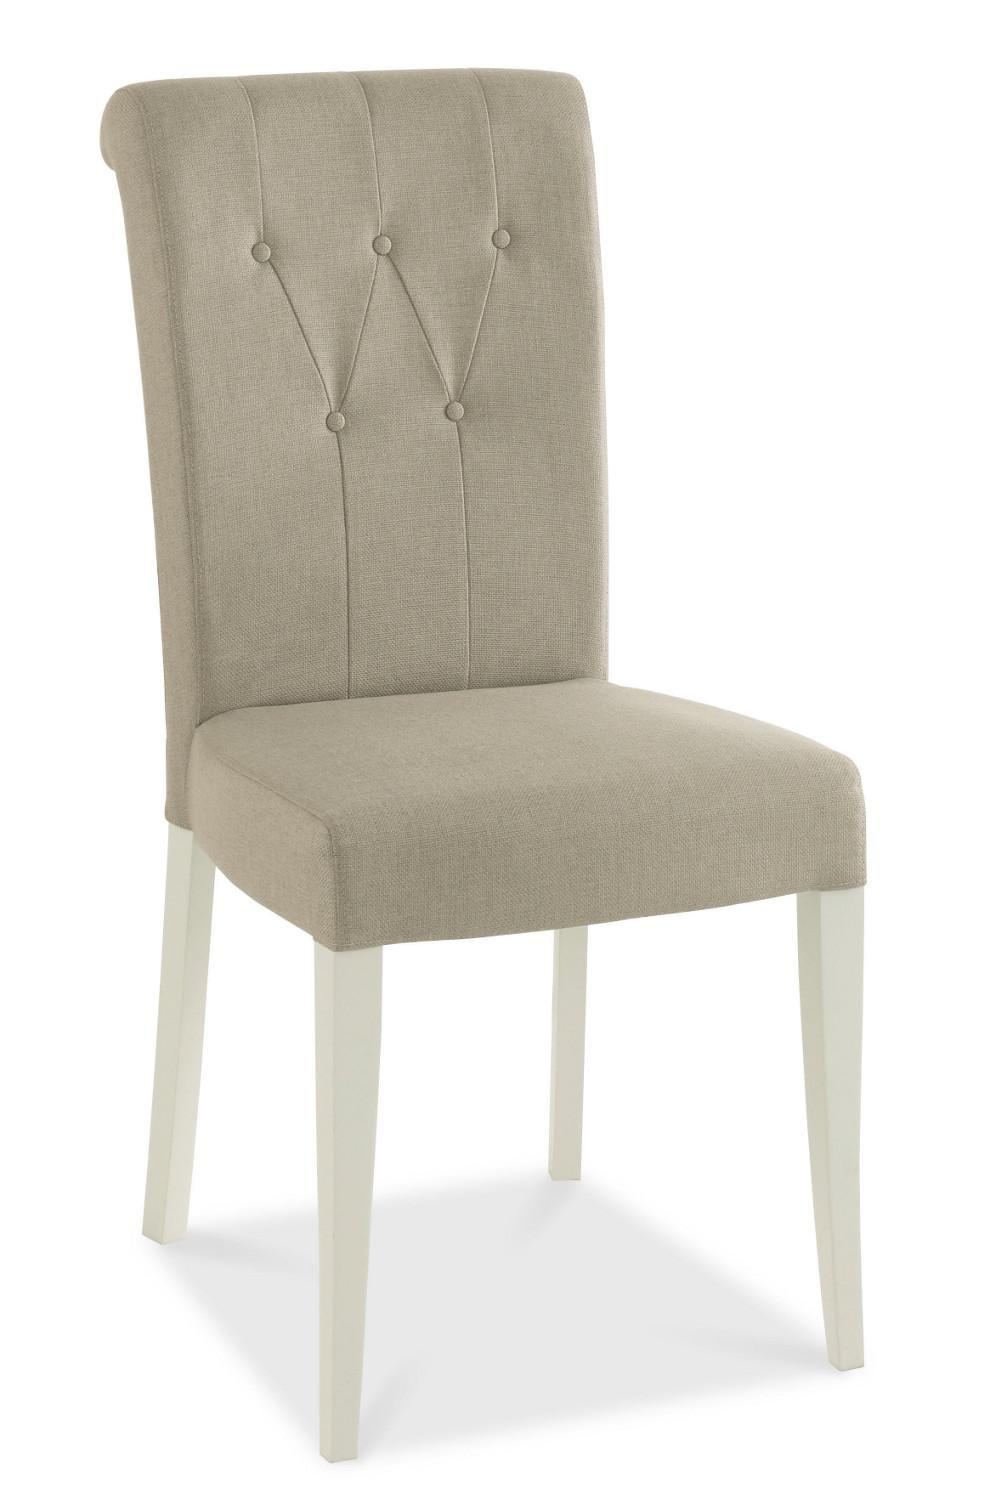 Hampstead Soft Grey Upholstered Rollback Dining Chair - pair (Hampstead Soft Grey and Oak Upholstered Rollback Dining Chair - pair)